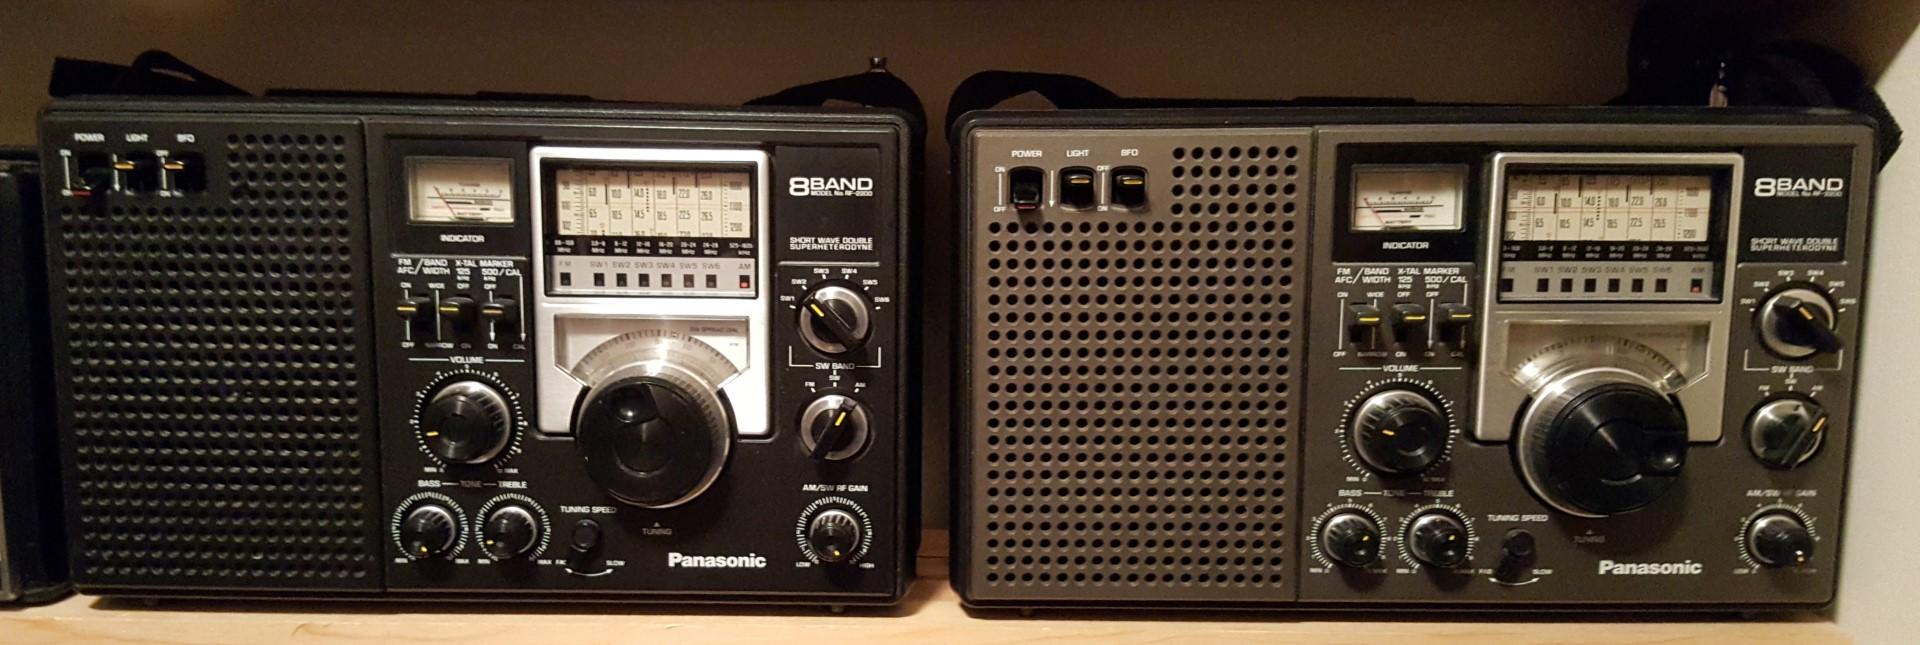 Panasonic RF-2200 | radiojayallen